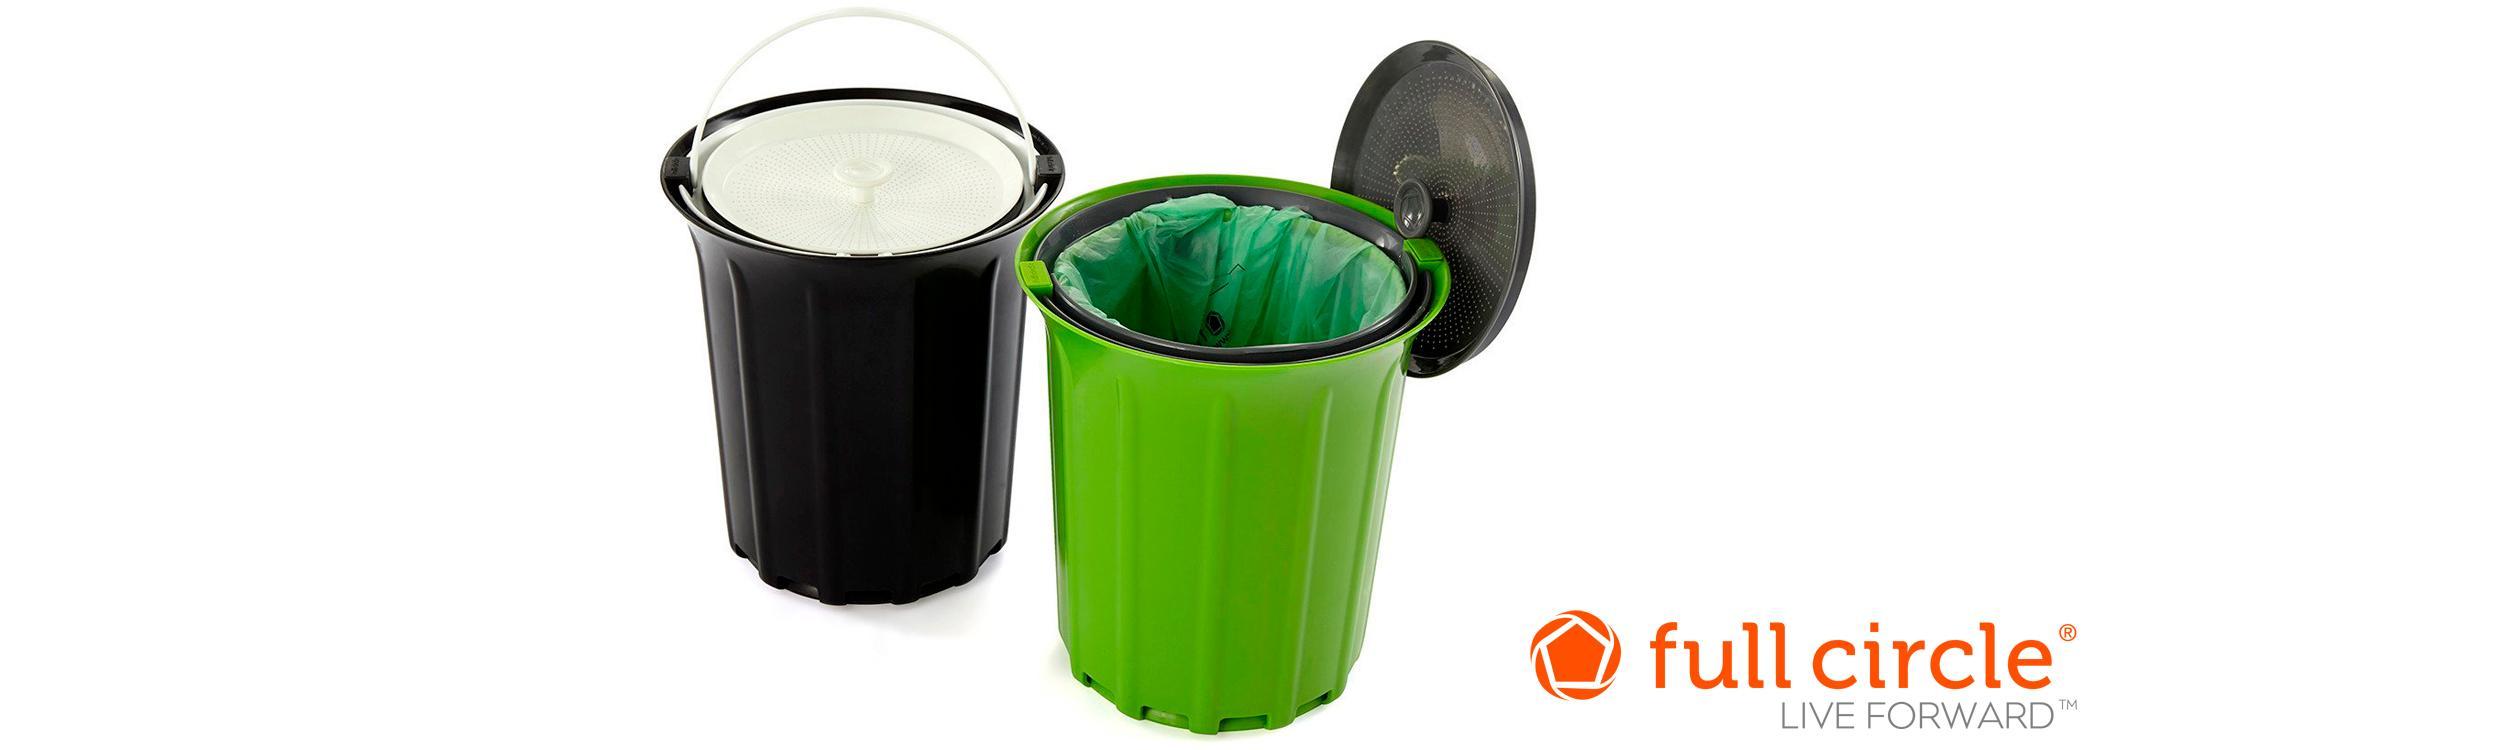 Amazon Com Full Circle Breeze Odor Free Countertop